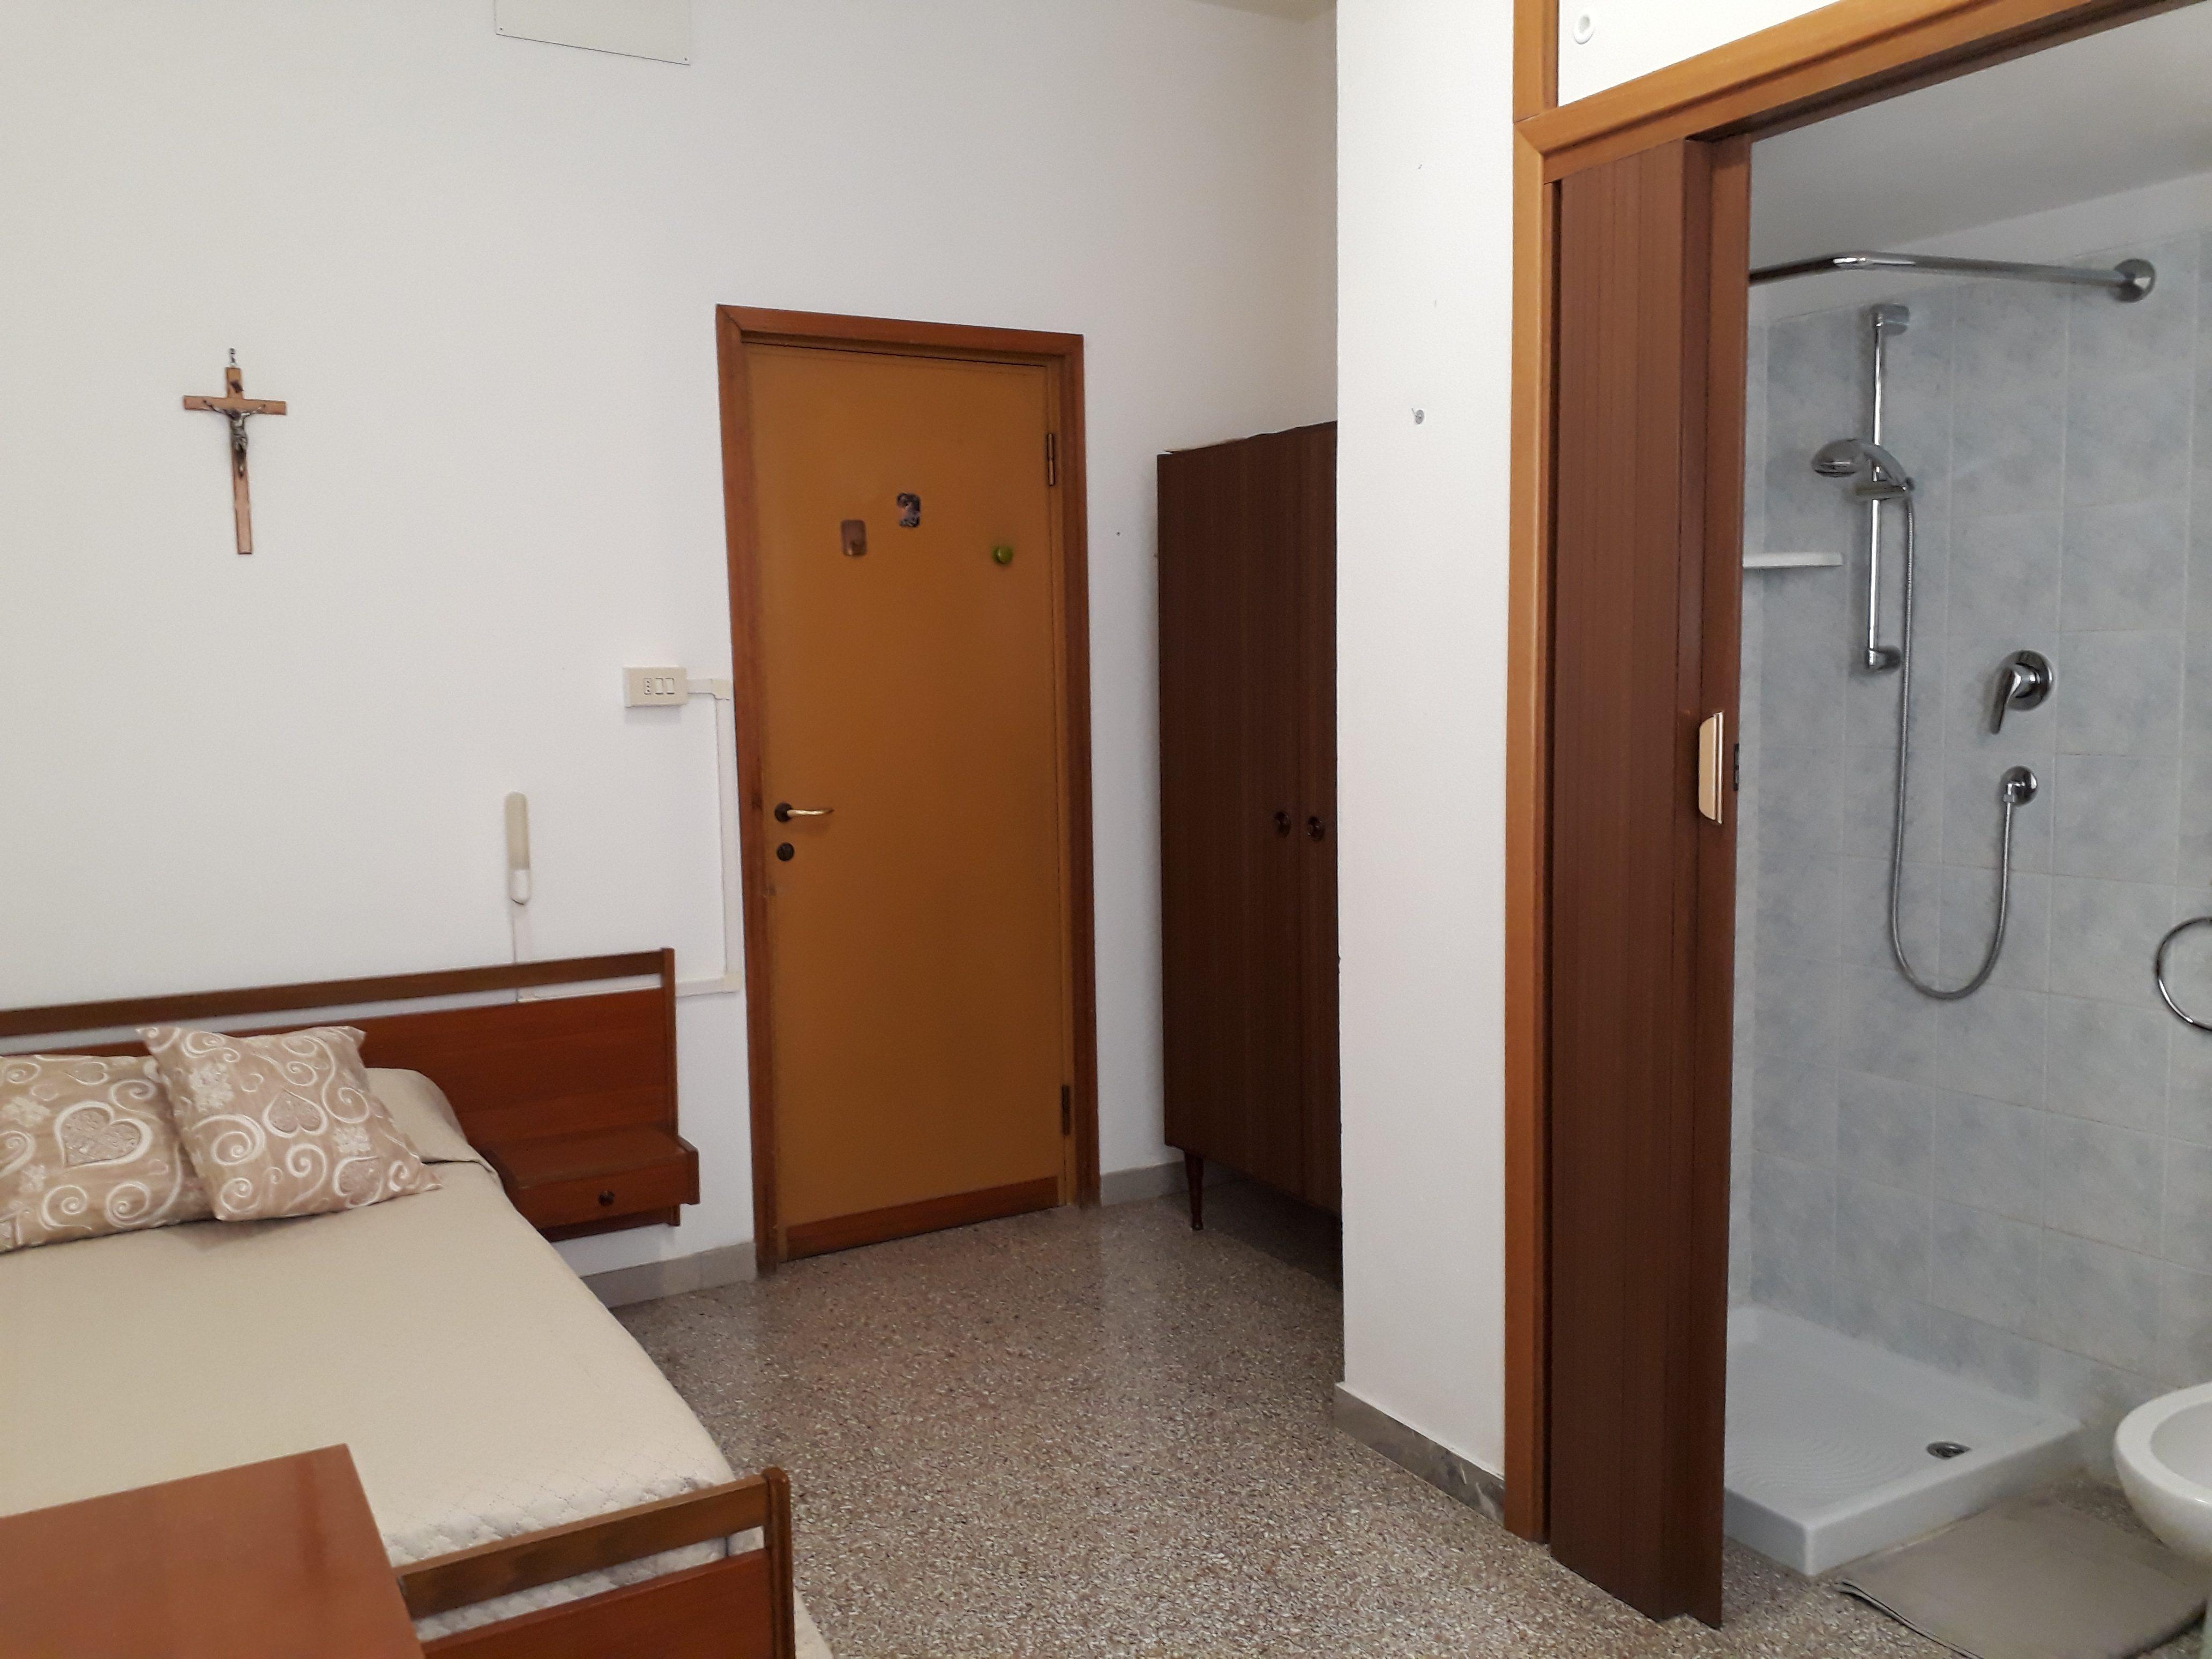 Istituto Santa Giuliana Via Mazzini 90 Bologna